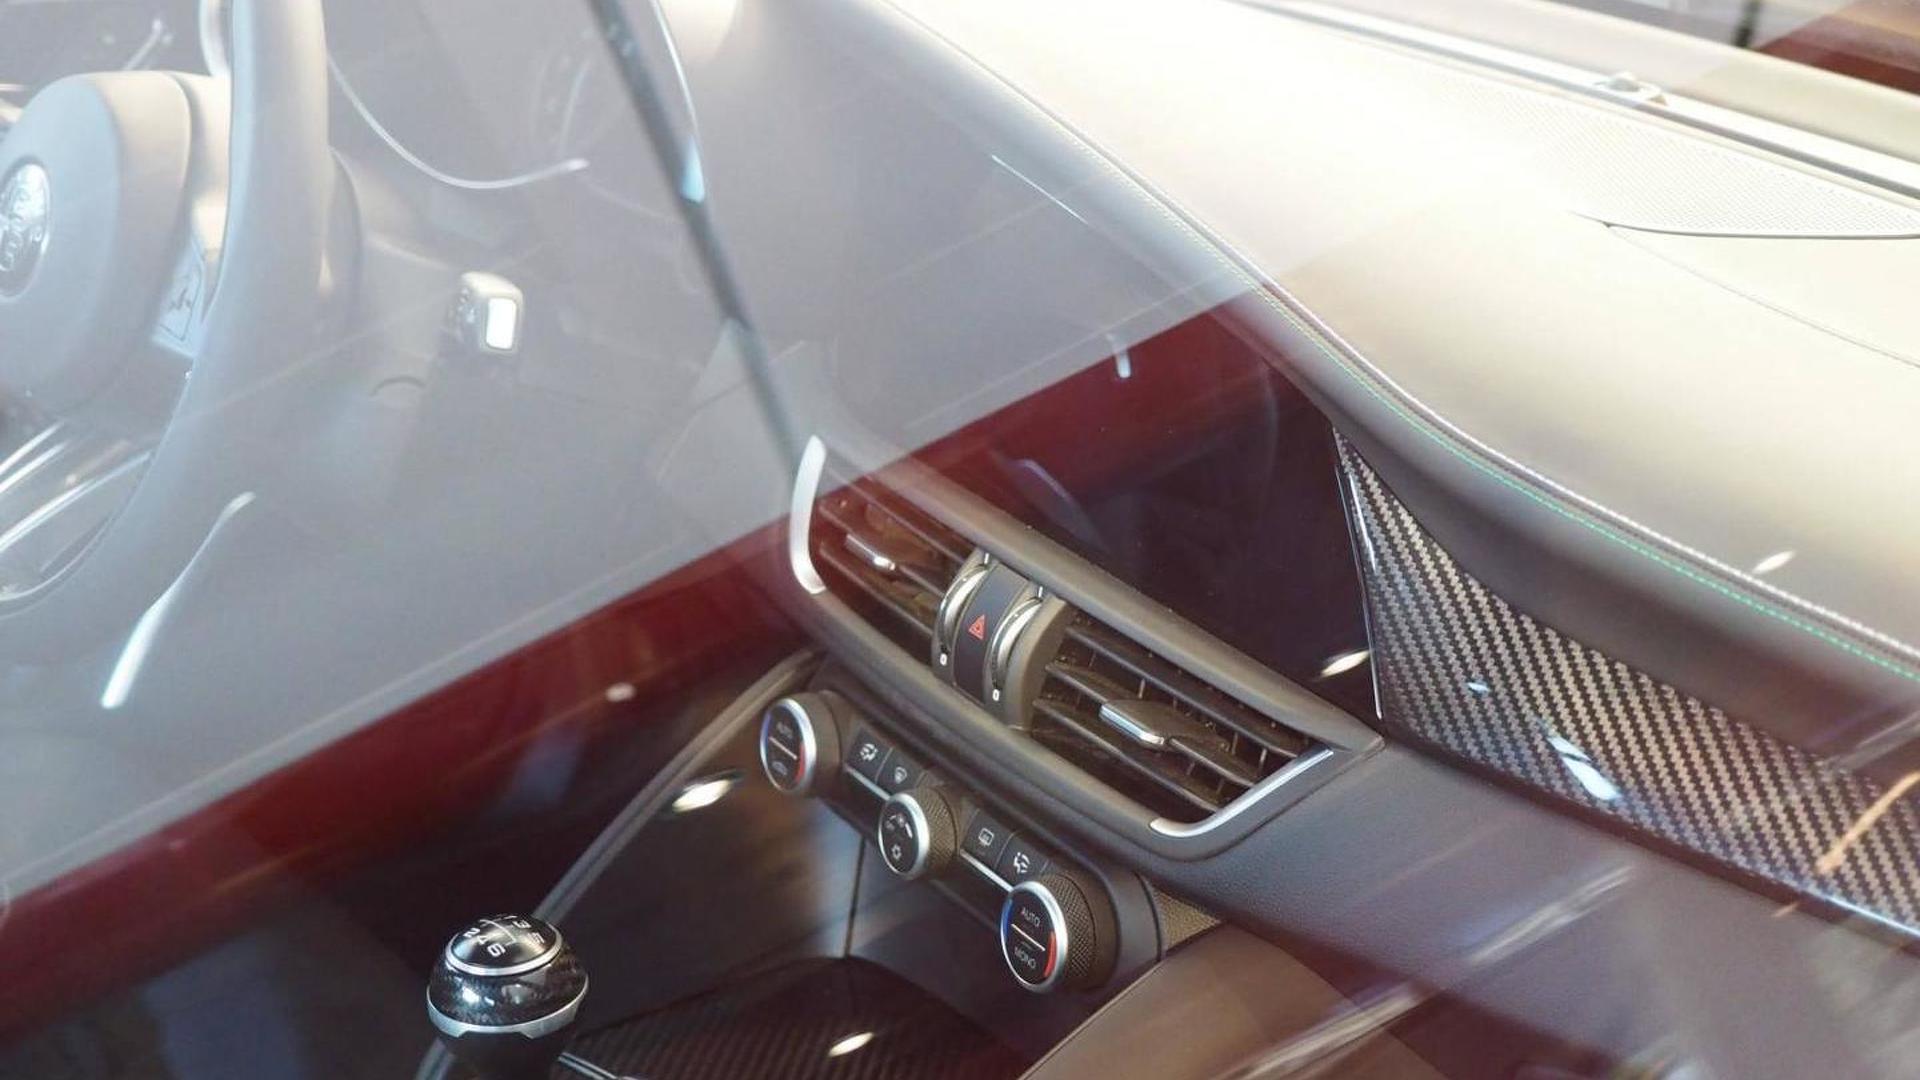 Alfa Romeo Giulia interior partly revealed in unofficial photos